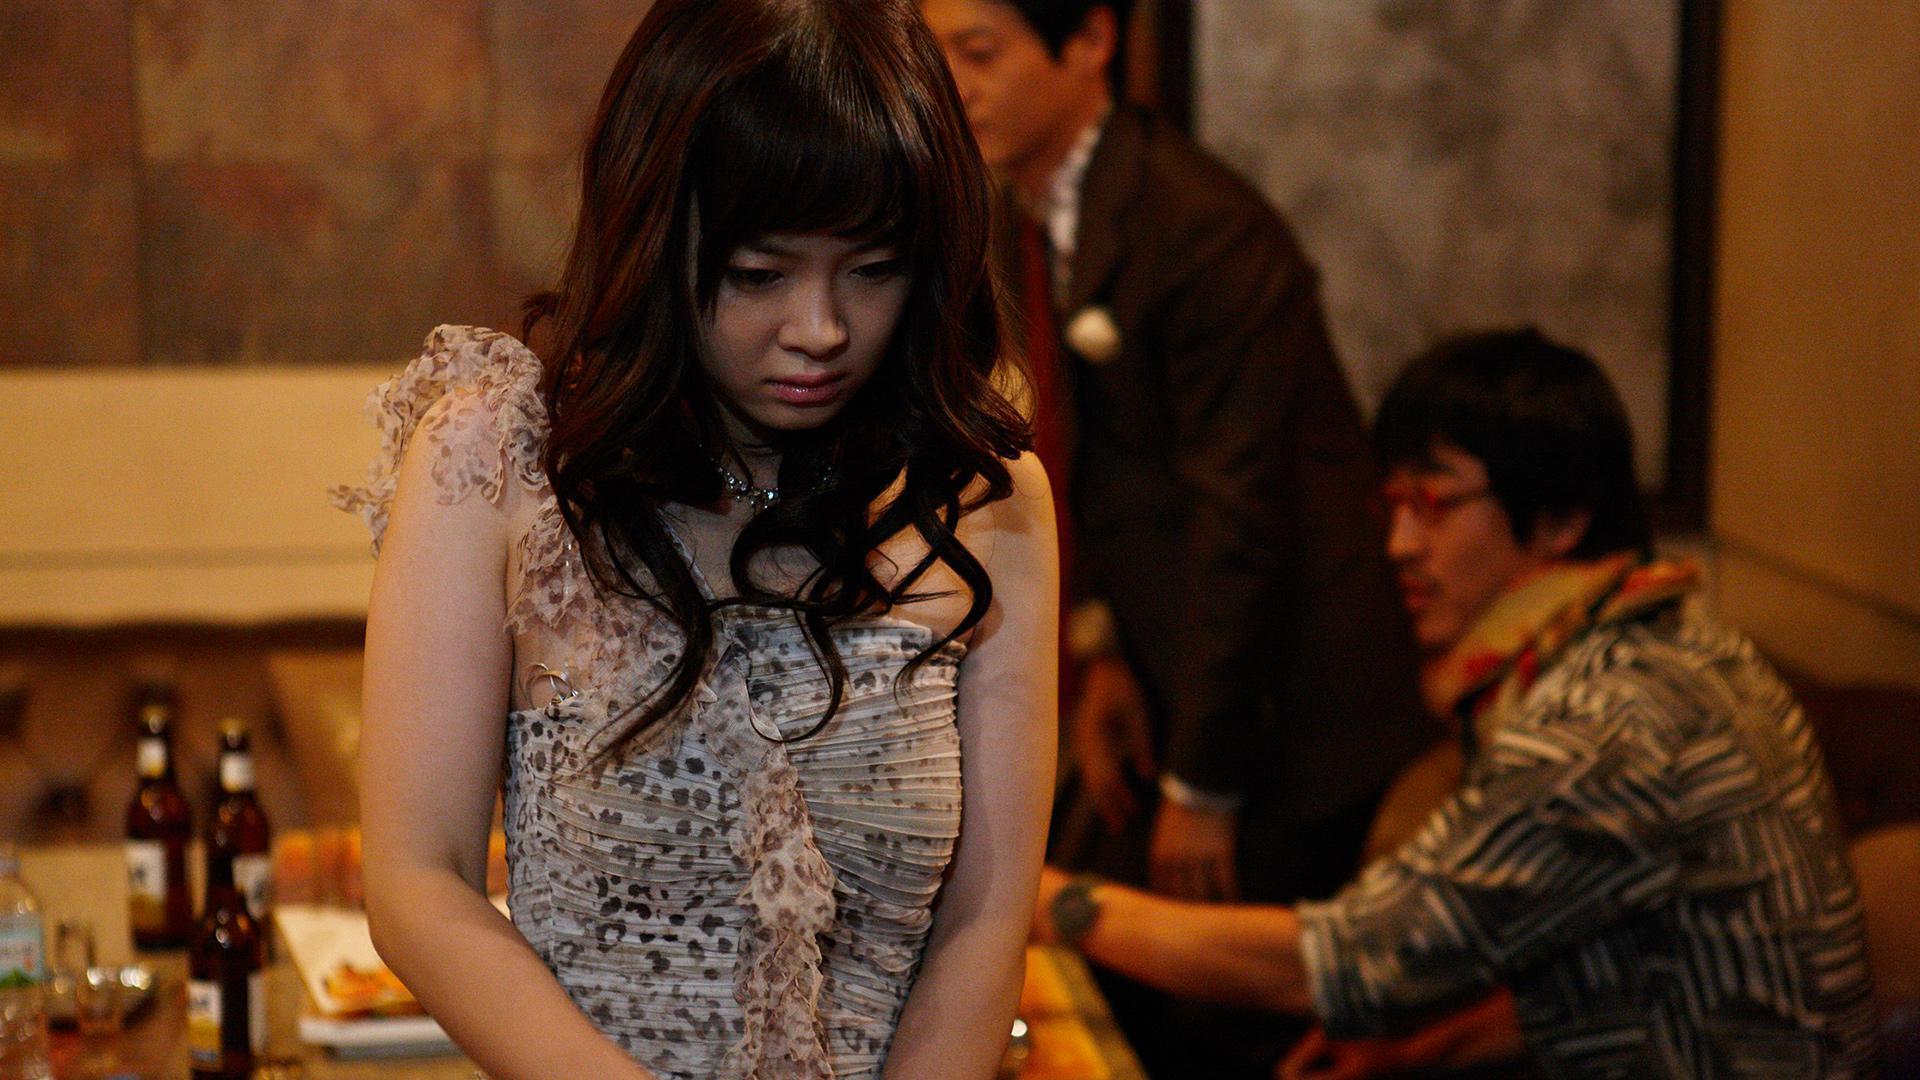 seung ho chui Lee seung-hui ( hangul : 이승희 ) may refer to: lee seung-hee (artist) (born 1963) sung-hi lee (born 1970), korean american actress nikki s lee (born 1970), photographer lee seung-hee (born 1988), footballer lee seung-hui ( hangul : 이승희 ) may refer to: lee seung-hee (artist) (born 1963) sung-hi lee (born 1970), korean american actress.